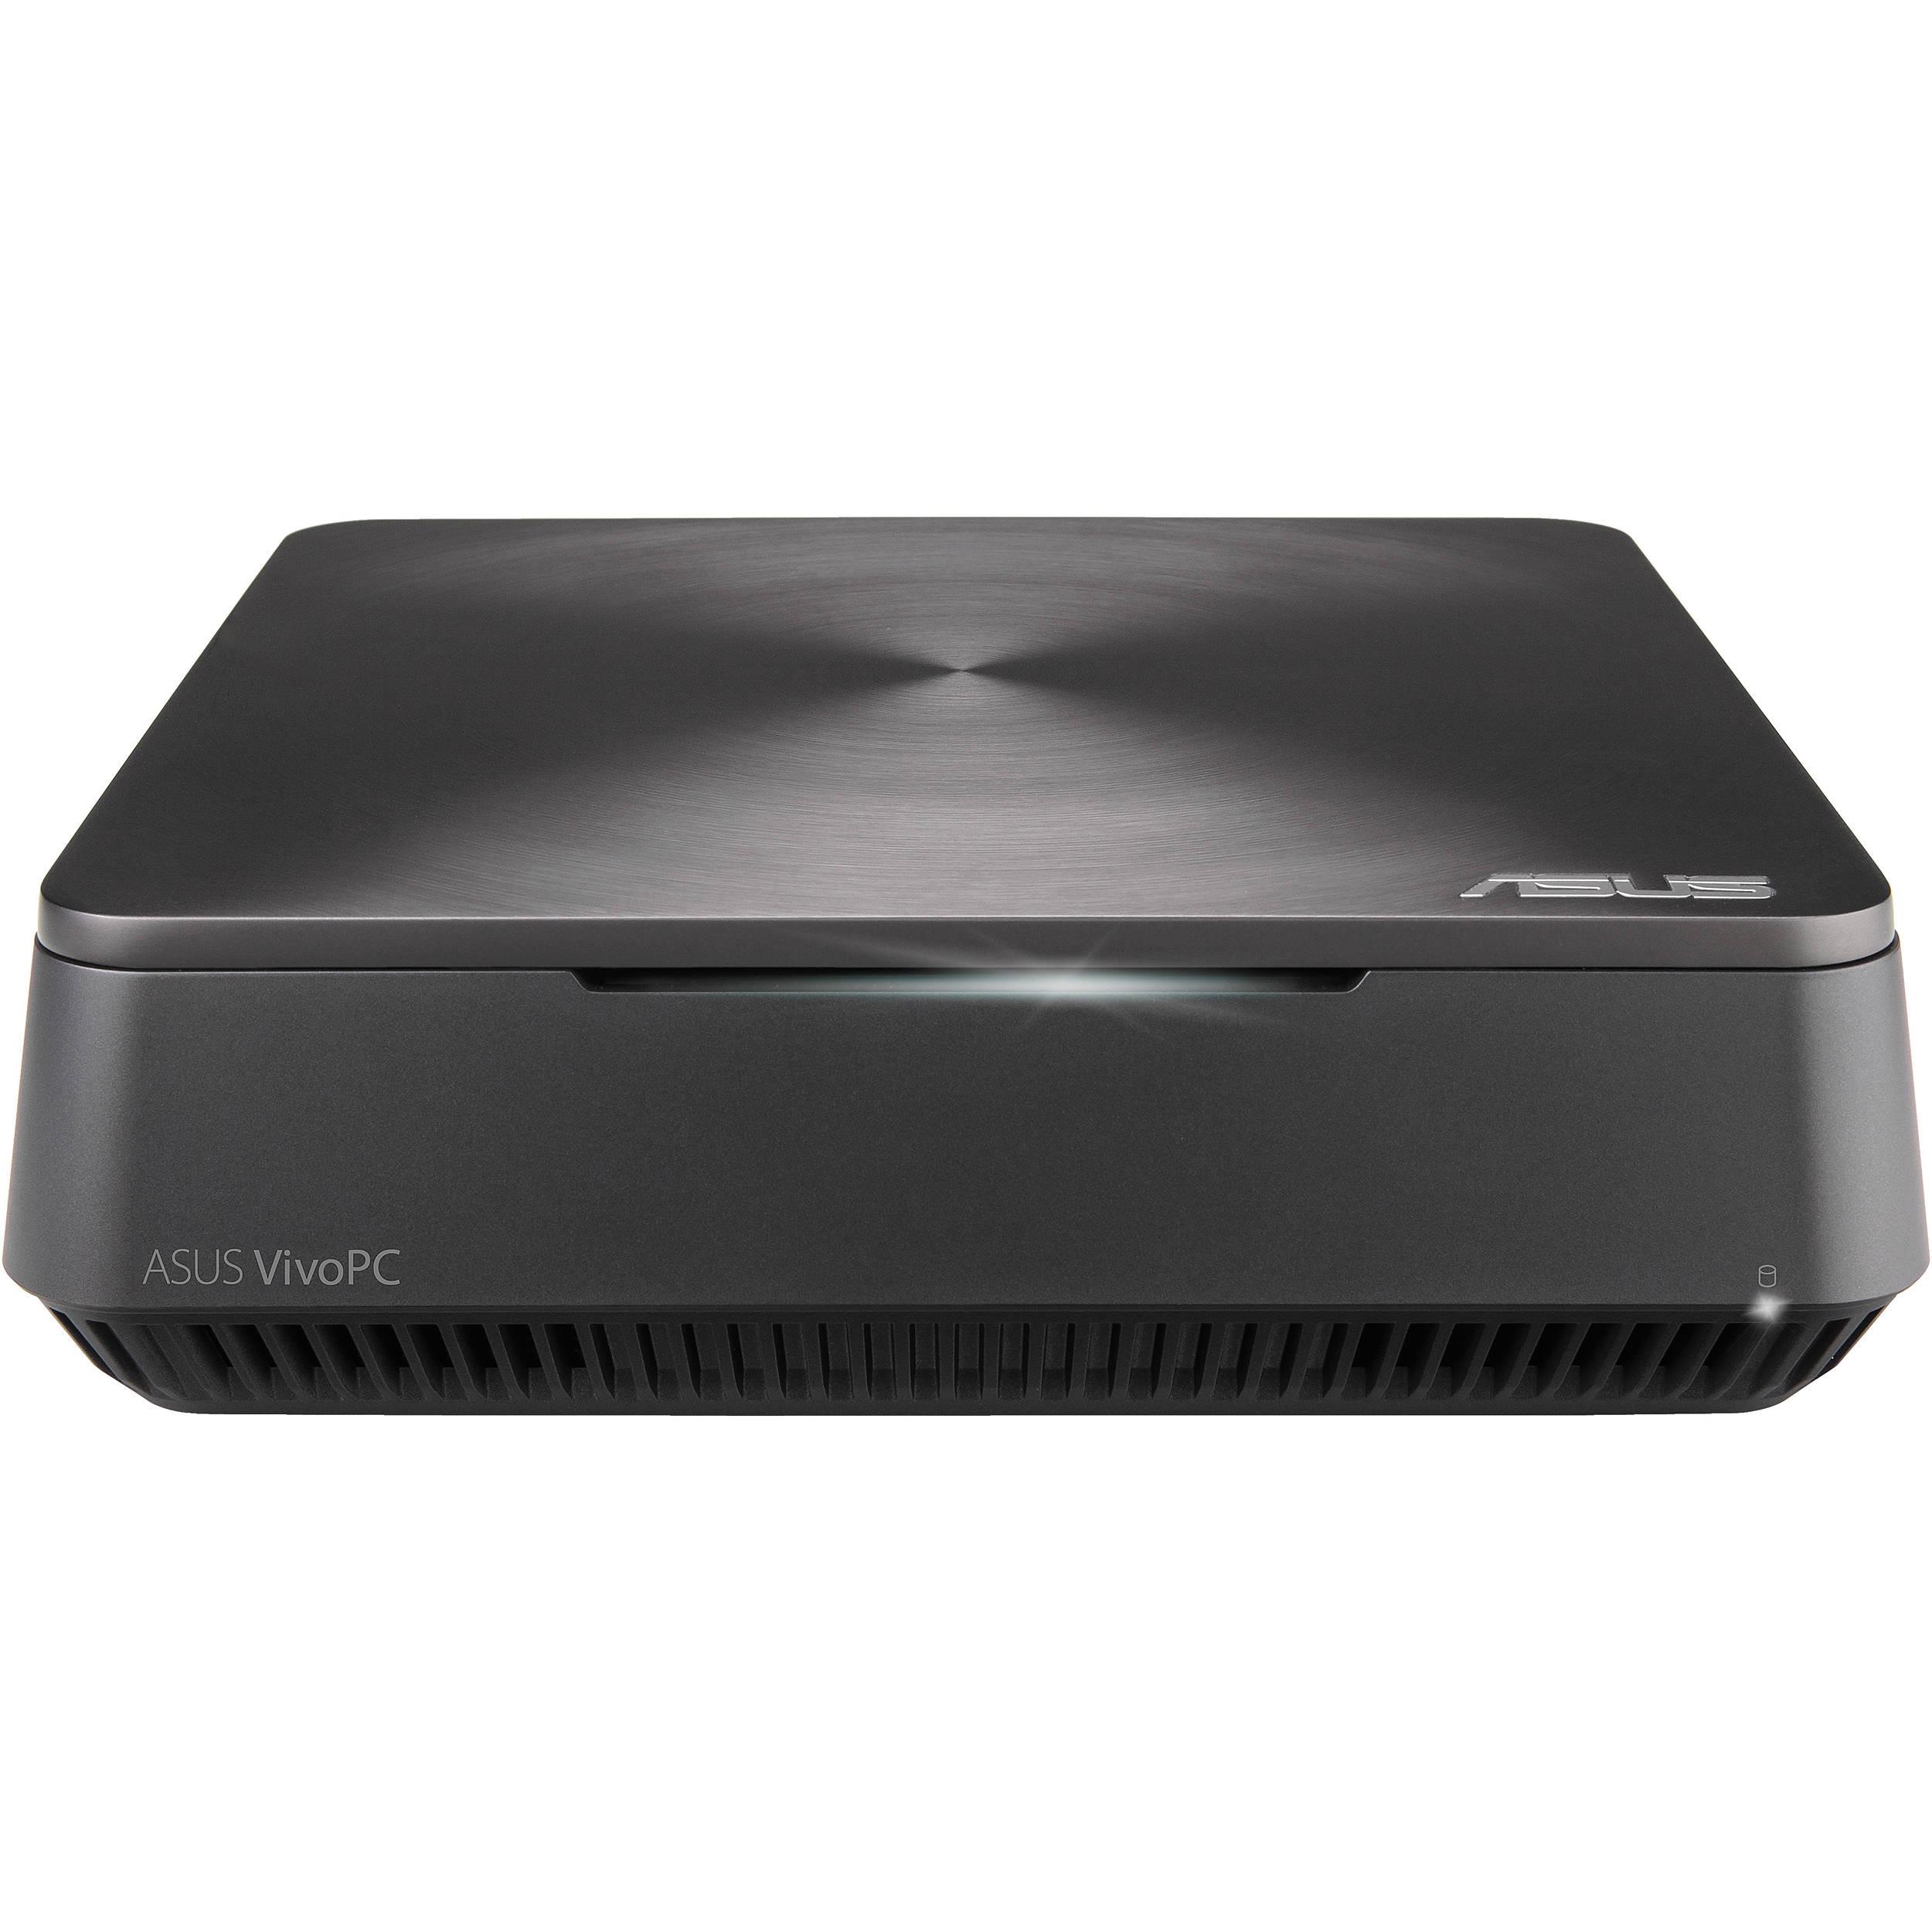 ASUS VivoPC VM62N Realtek LAN Driver (2019)